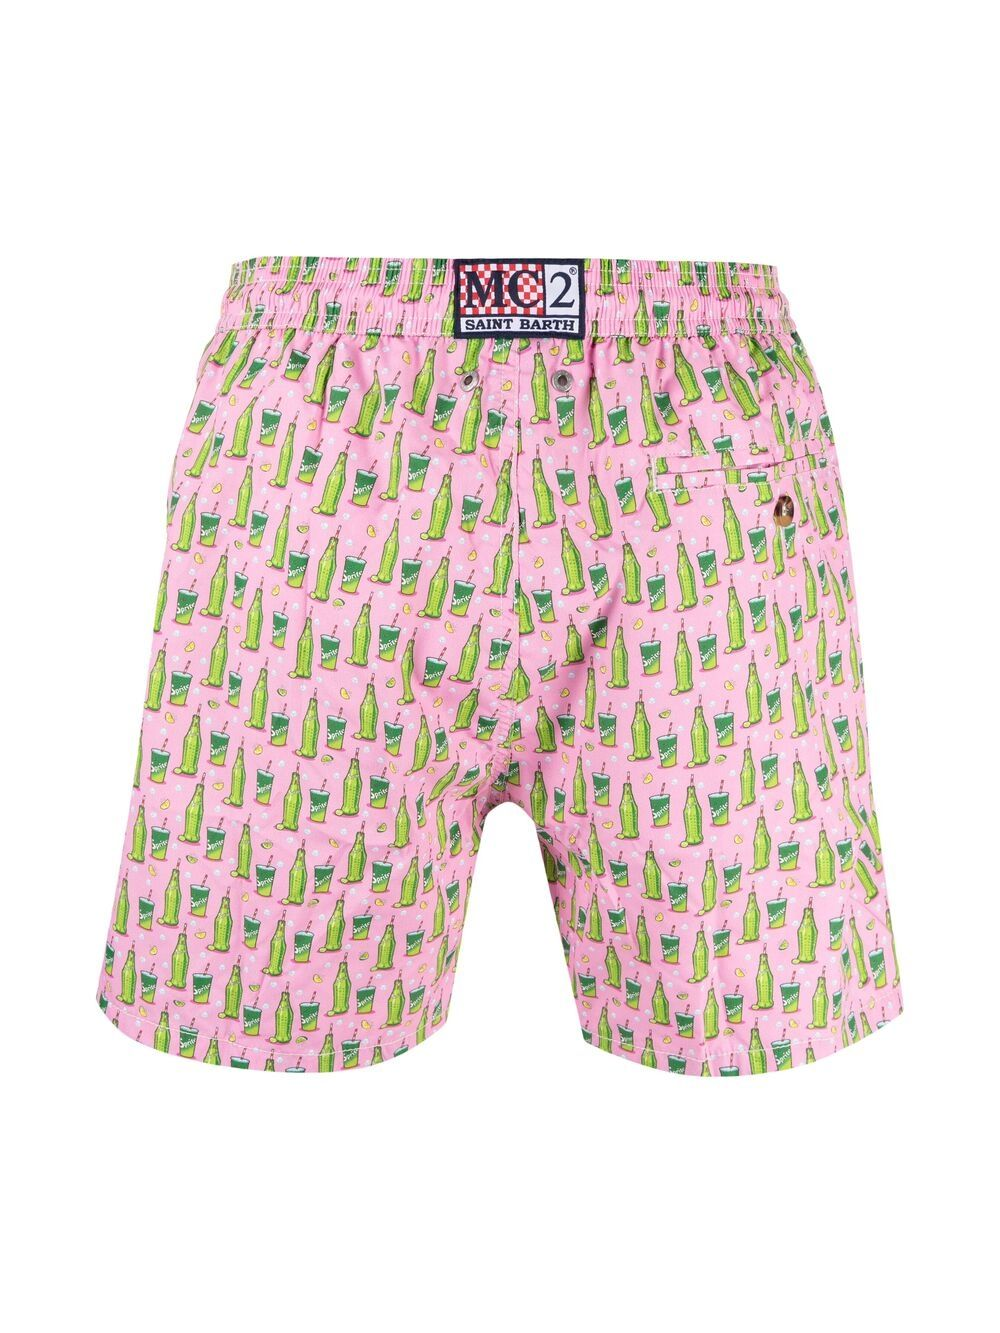 Pink and green Sprite print swim shorts  MC2 |  | LIGHTING MICRO FANTASY-SPRITE MINI21